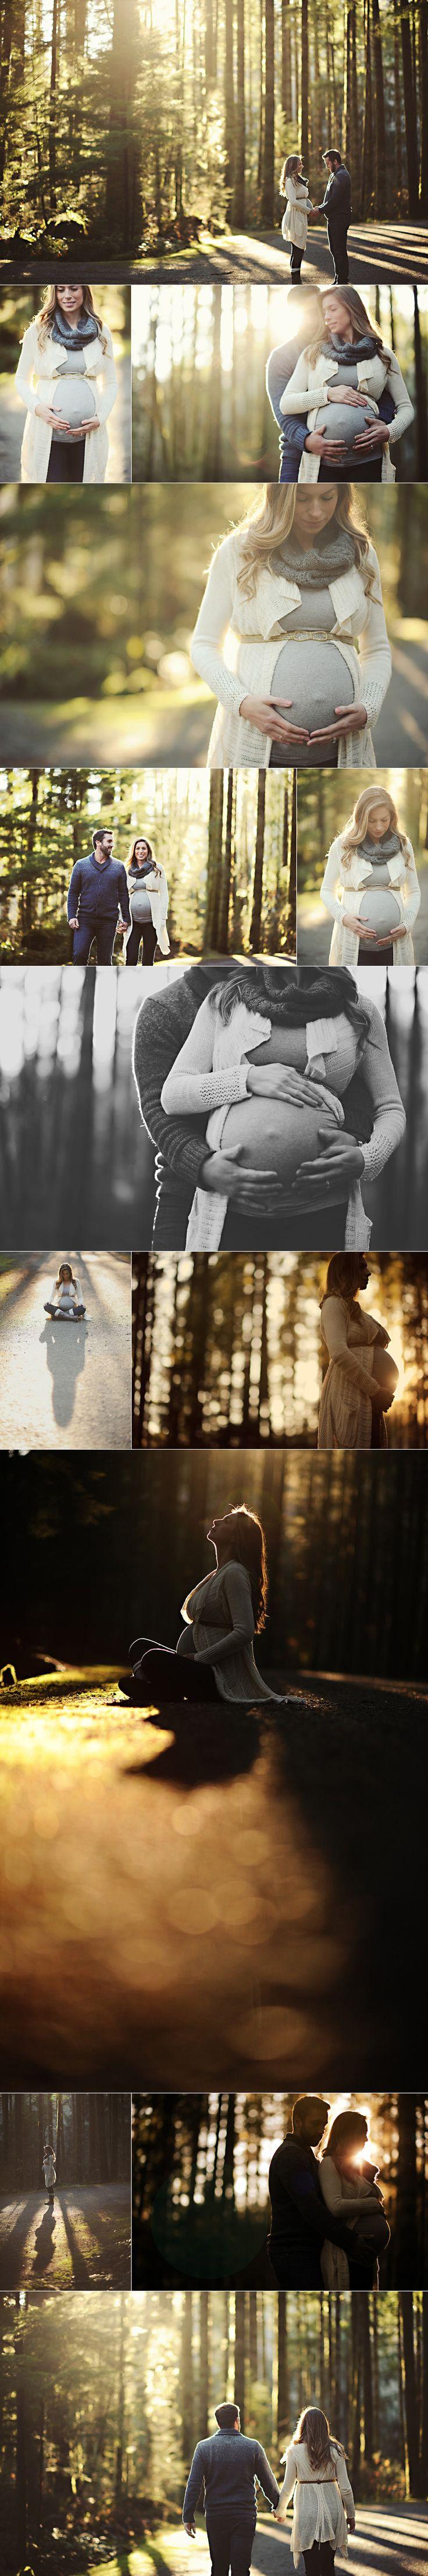 best outdoor maternity photos, beautiful light, amazing maternity photos, beautiful outdoor maternity, pregnant outdoor,